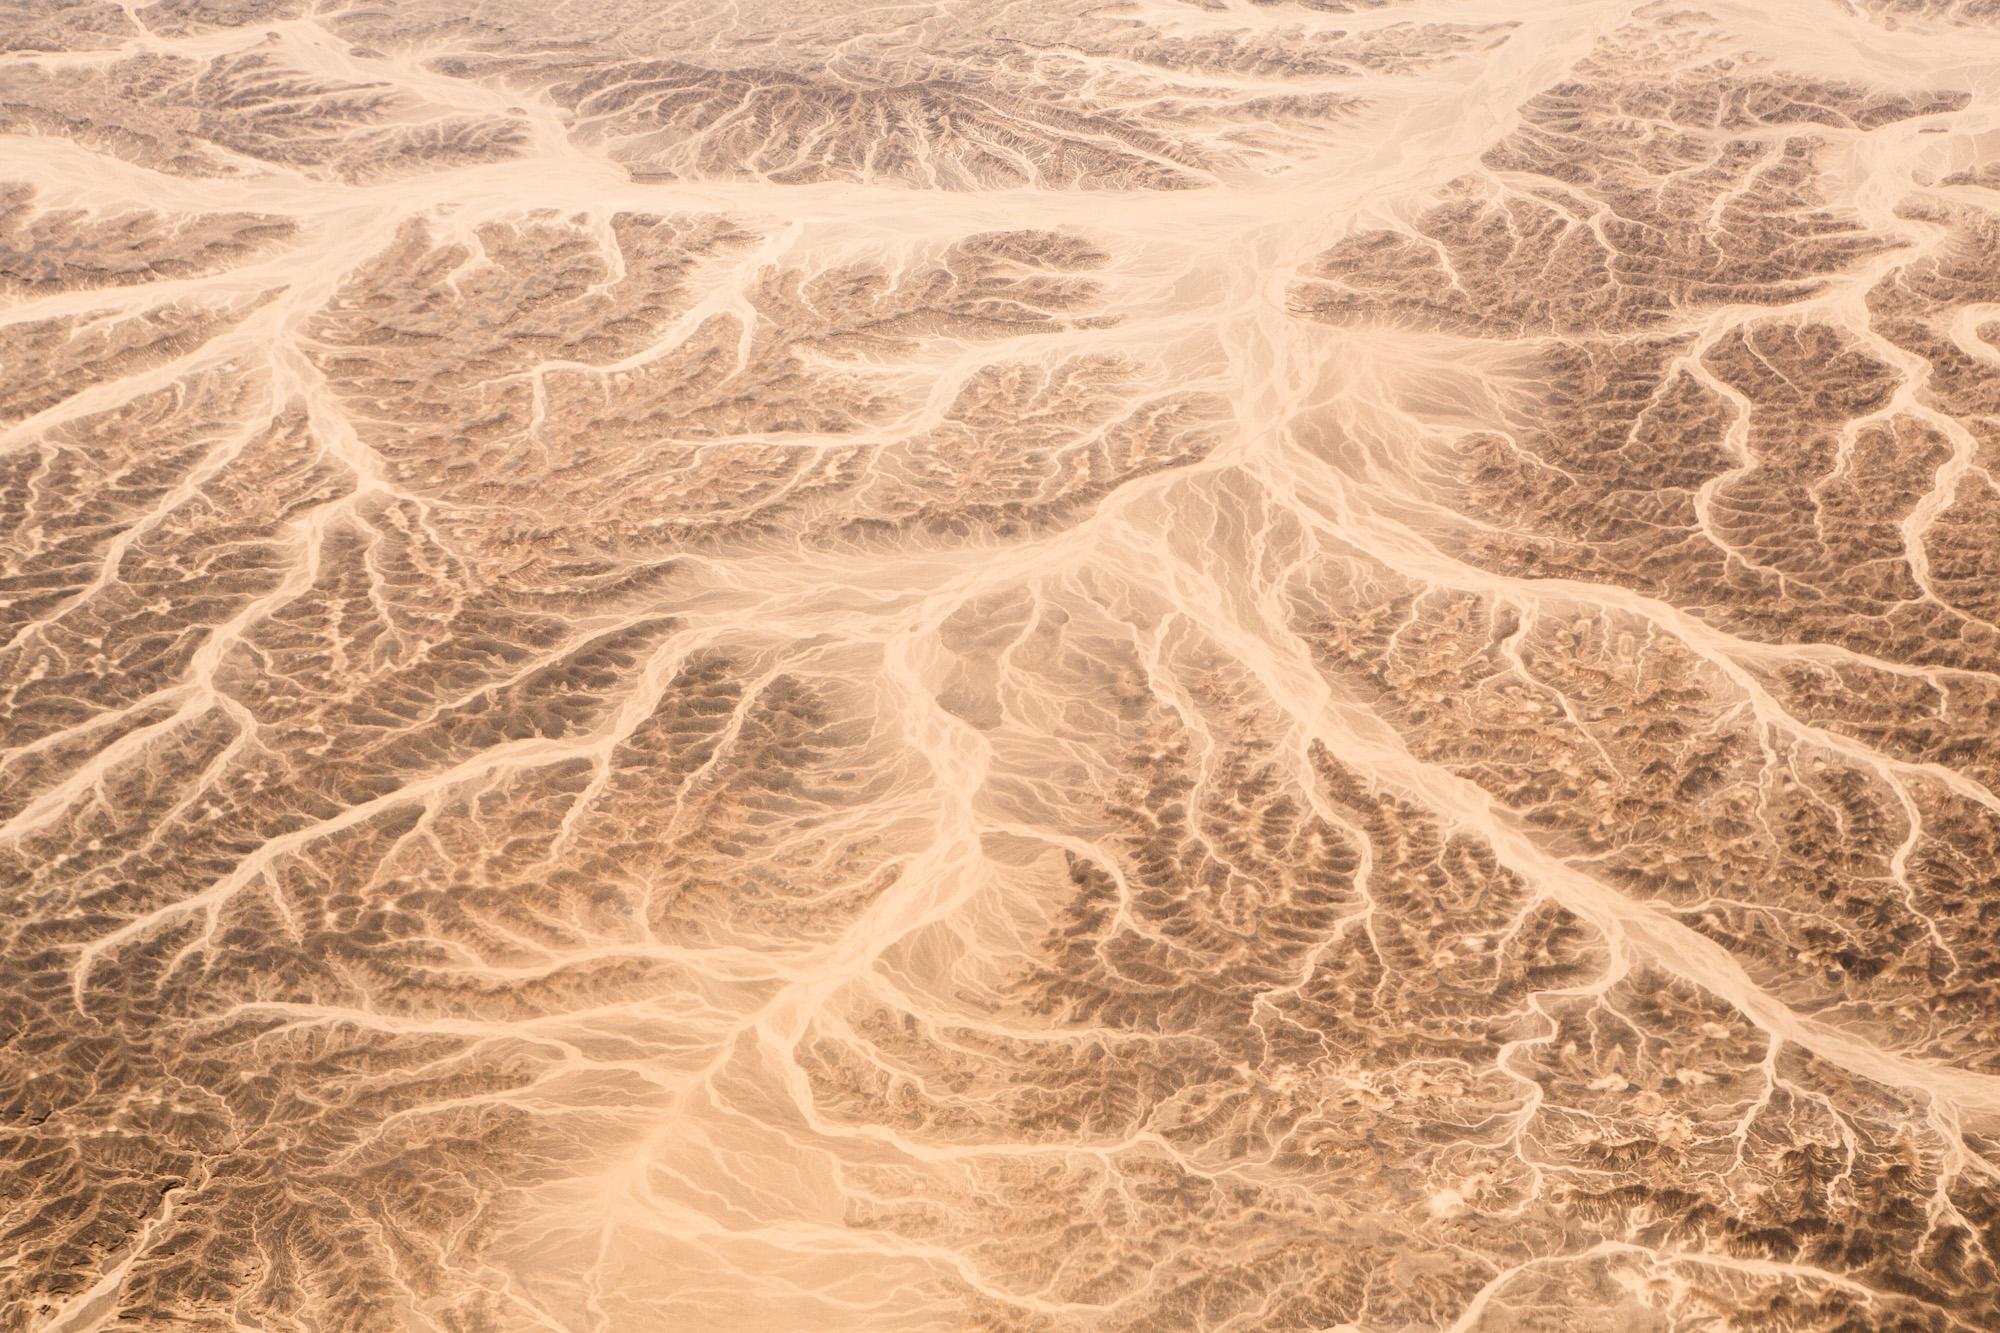 Deserts - Survey #3, 2015